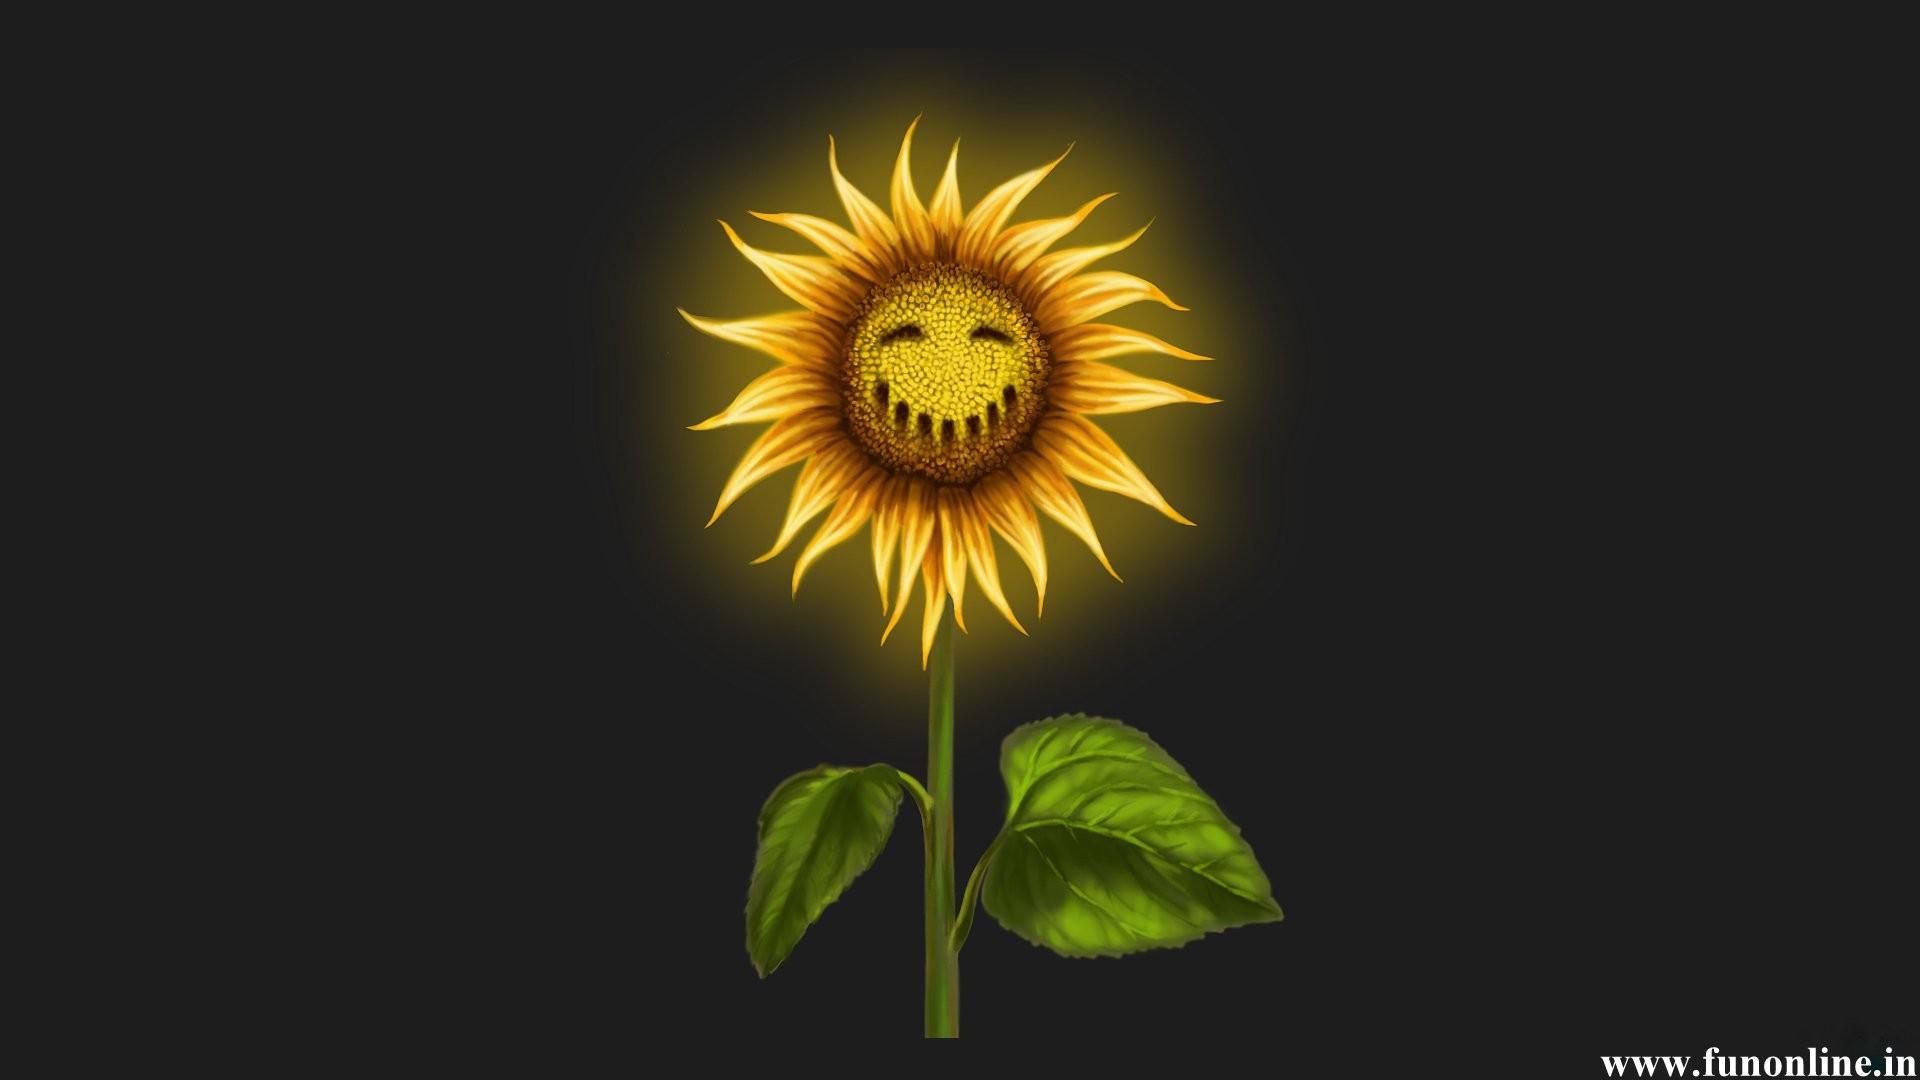 Halloween Sunflower